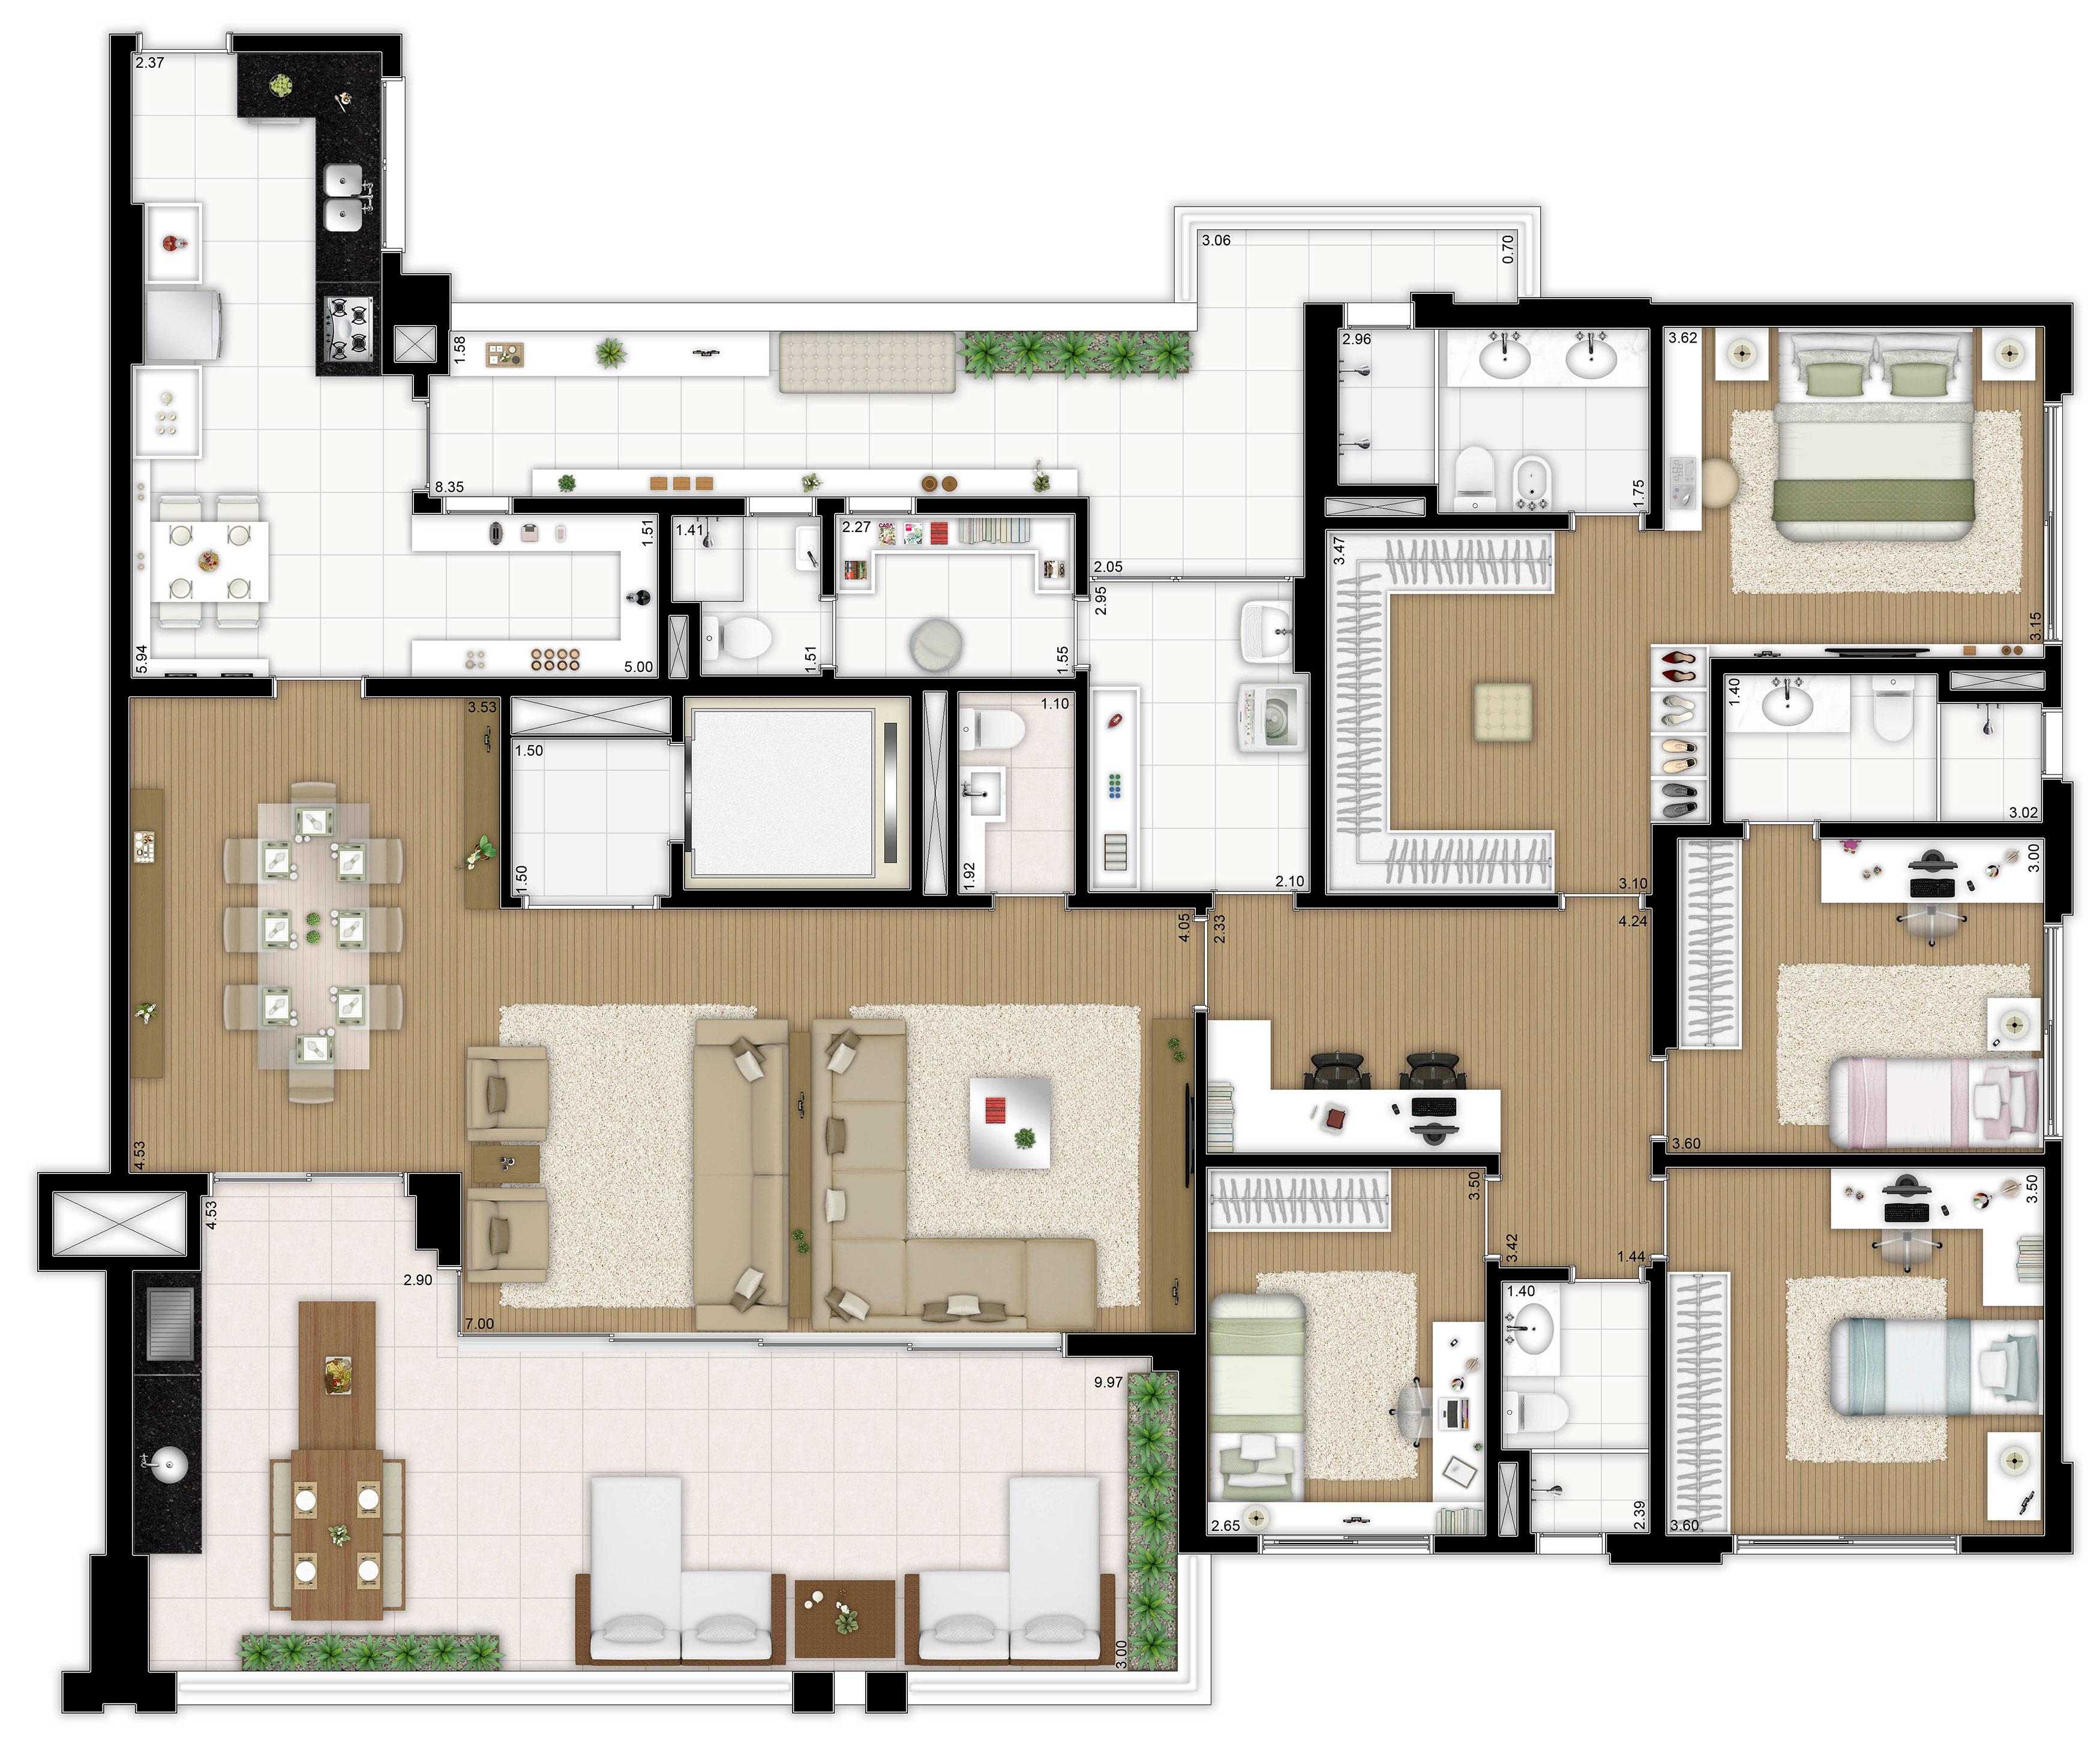 241 m² - 4 dormitórios